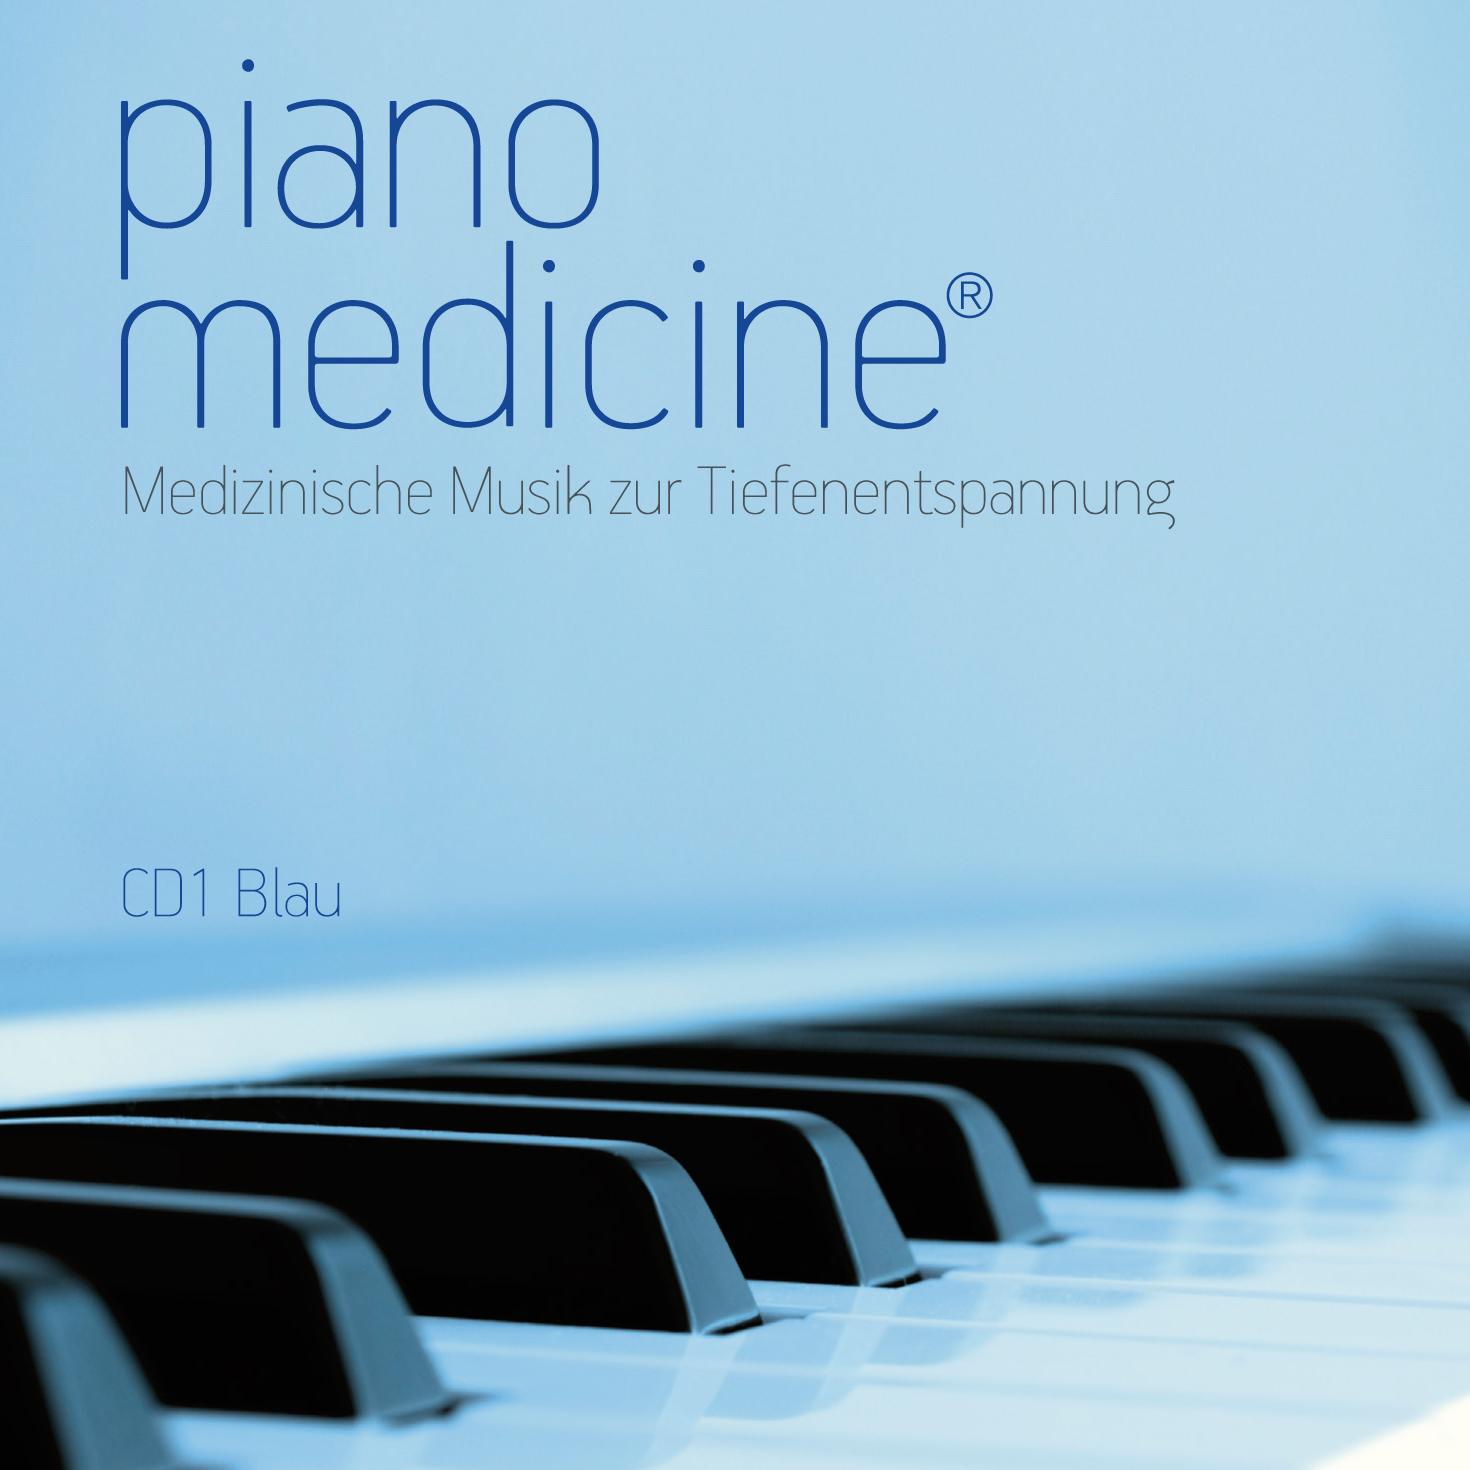 piano medicine® Musik zur Tiefenentspannung